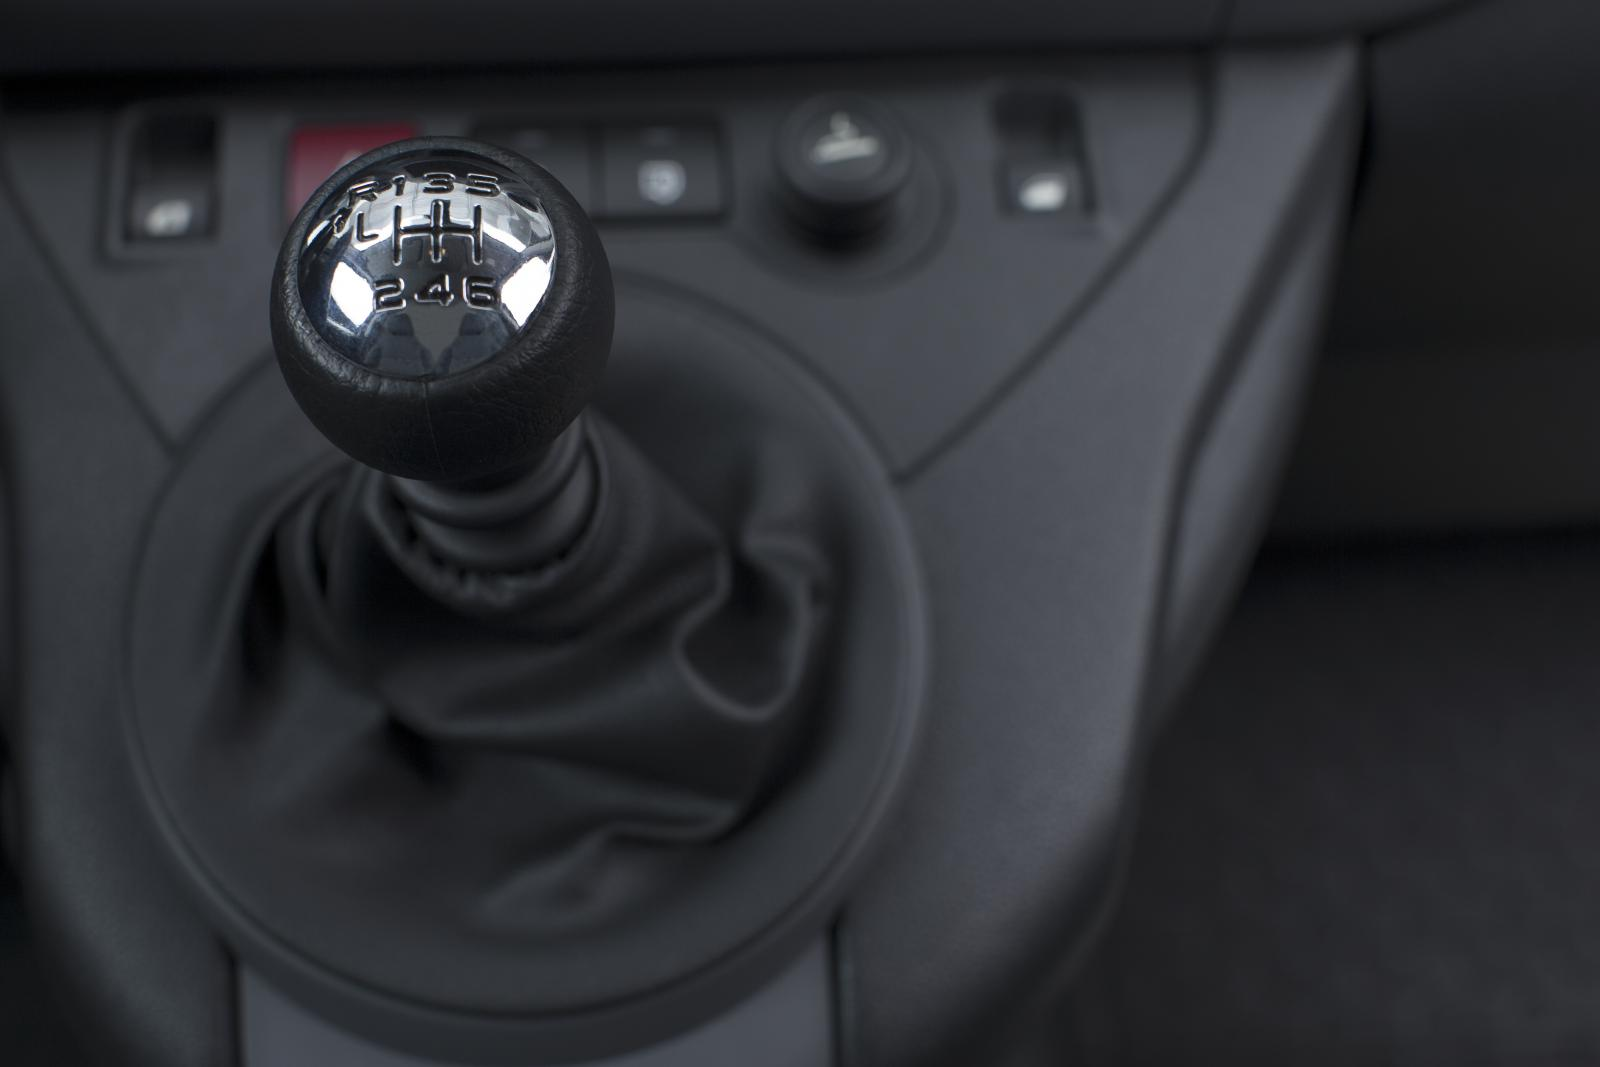 Berlingo 2 levier de vitesse